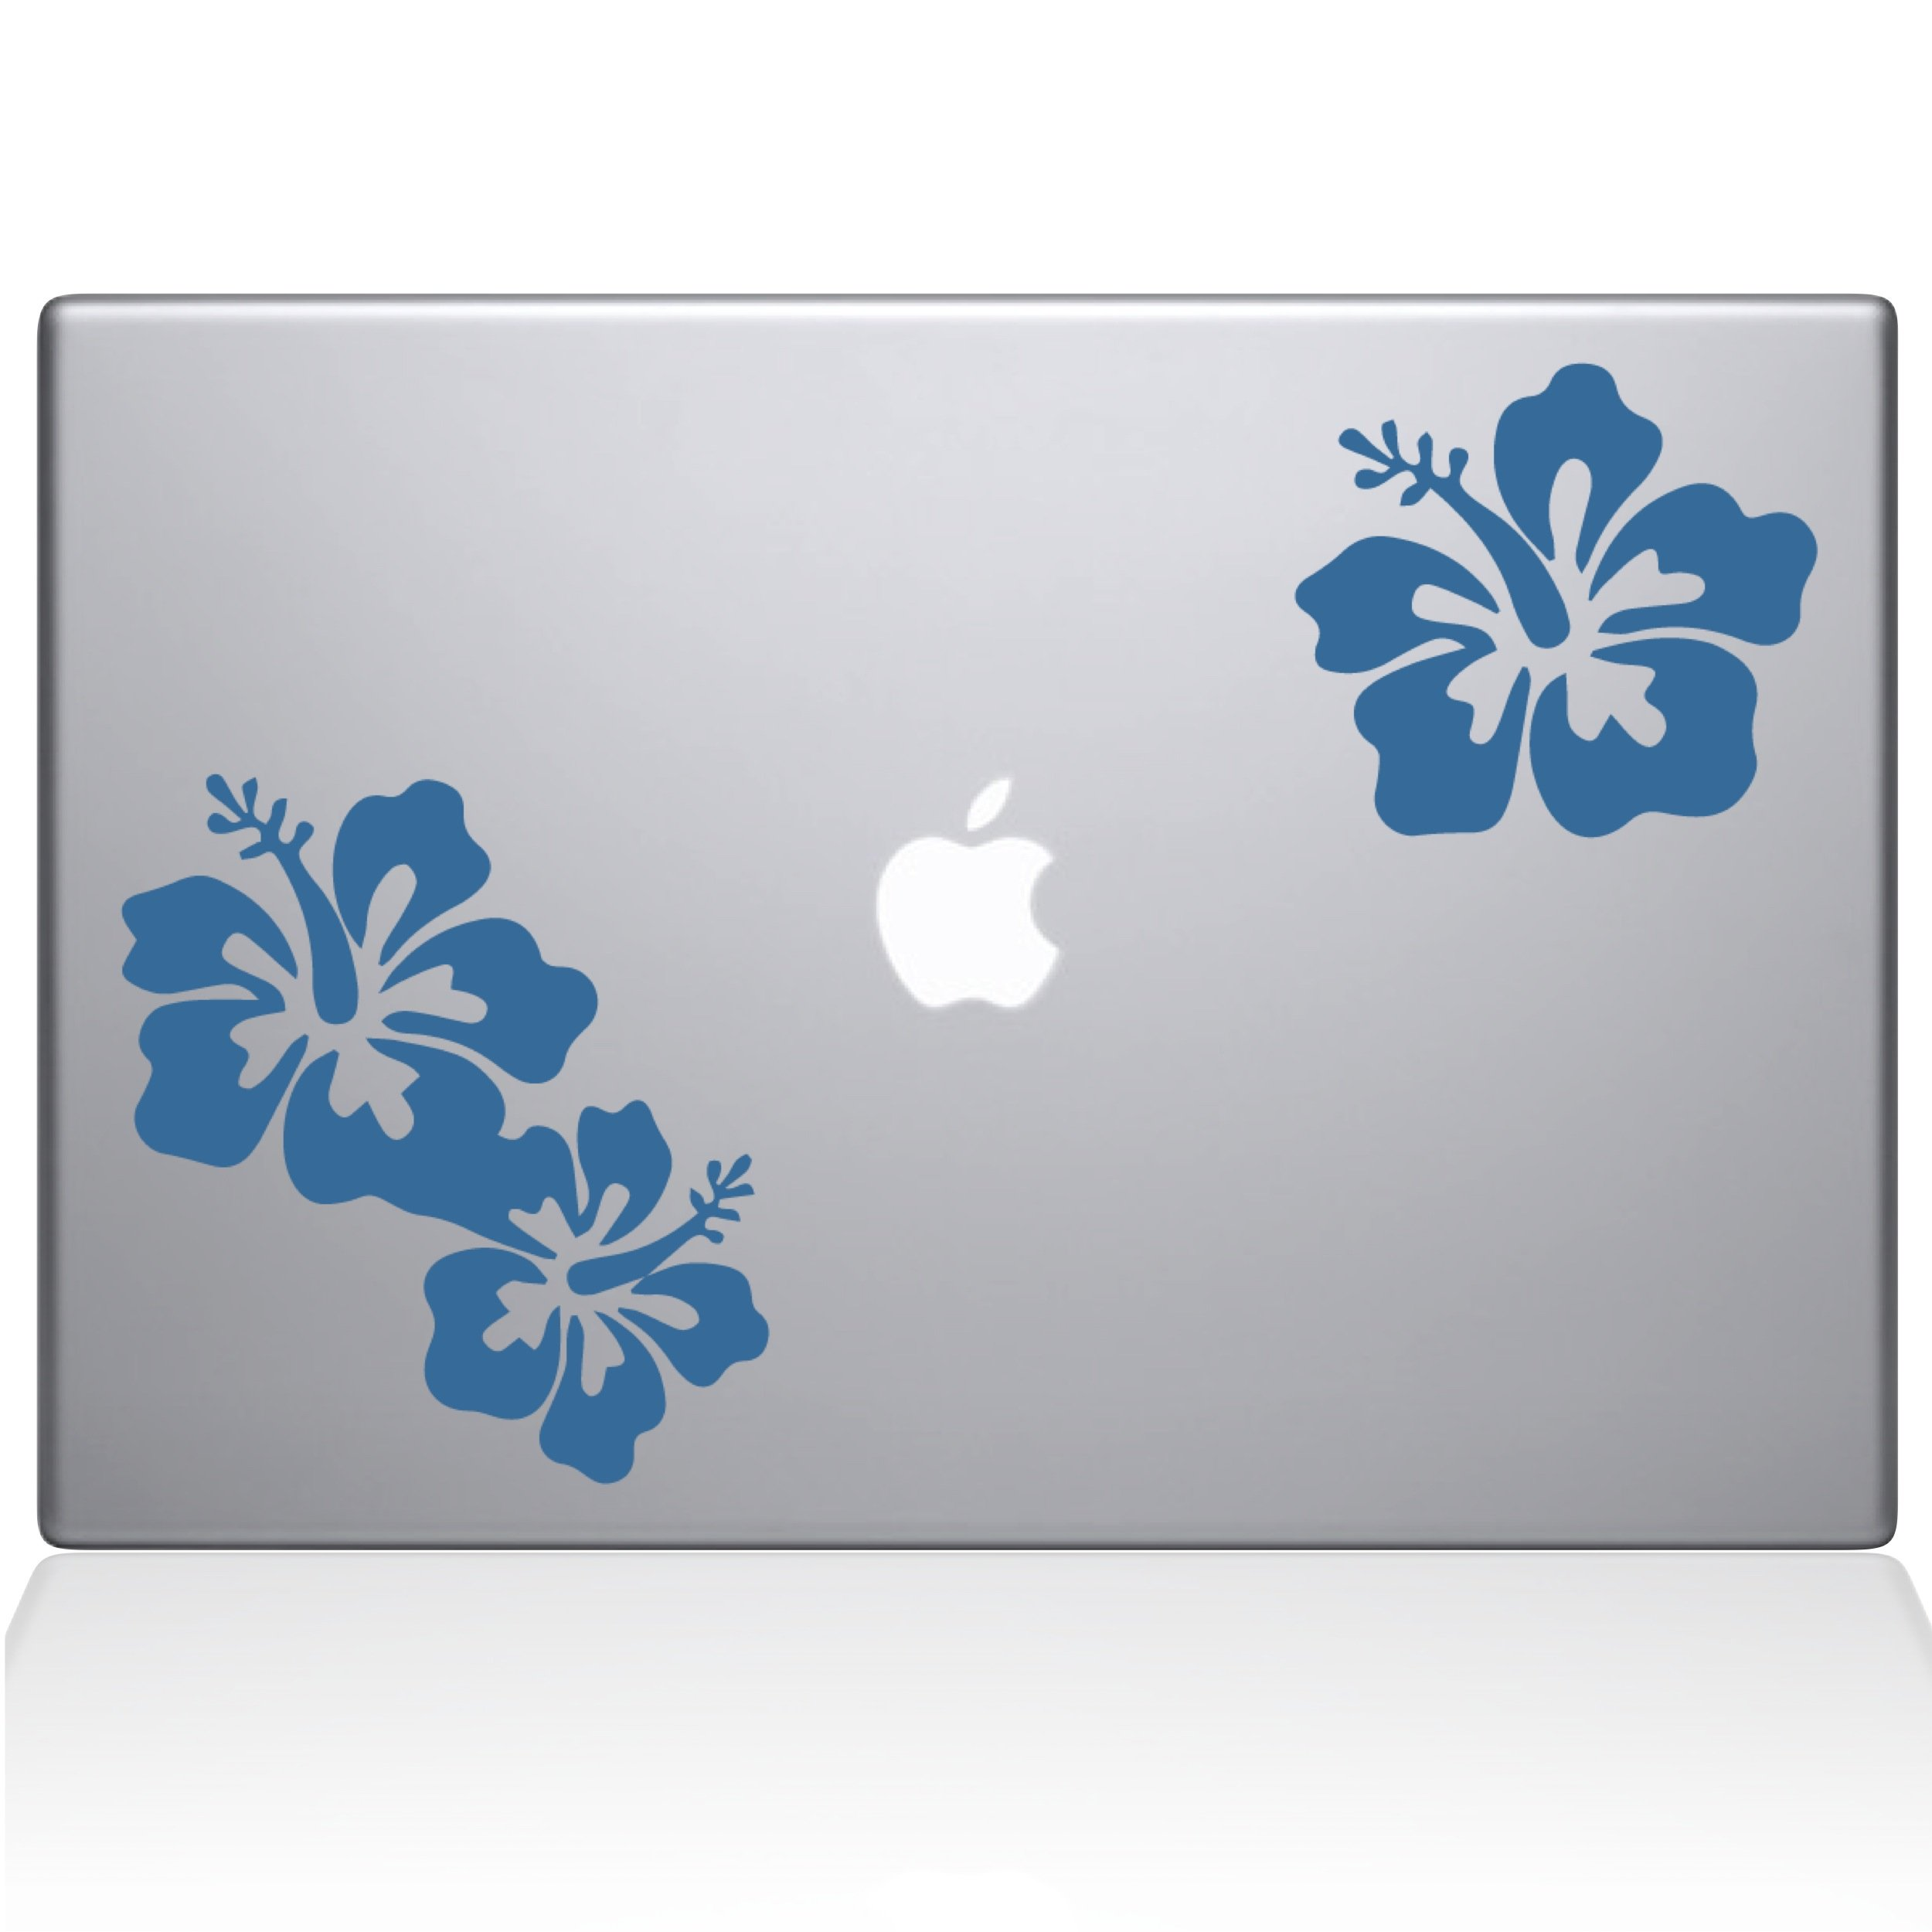 The Decal Guru Hibiscus Decal Vinyl Sticker, 15'' MacBook Pro (2015 & Older Models), Light Blue (1456-MAC-15P-LB)